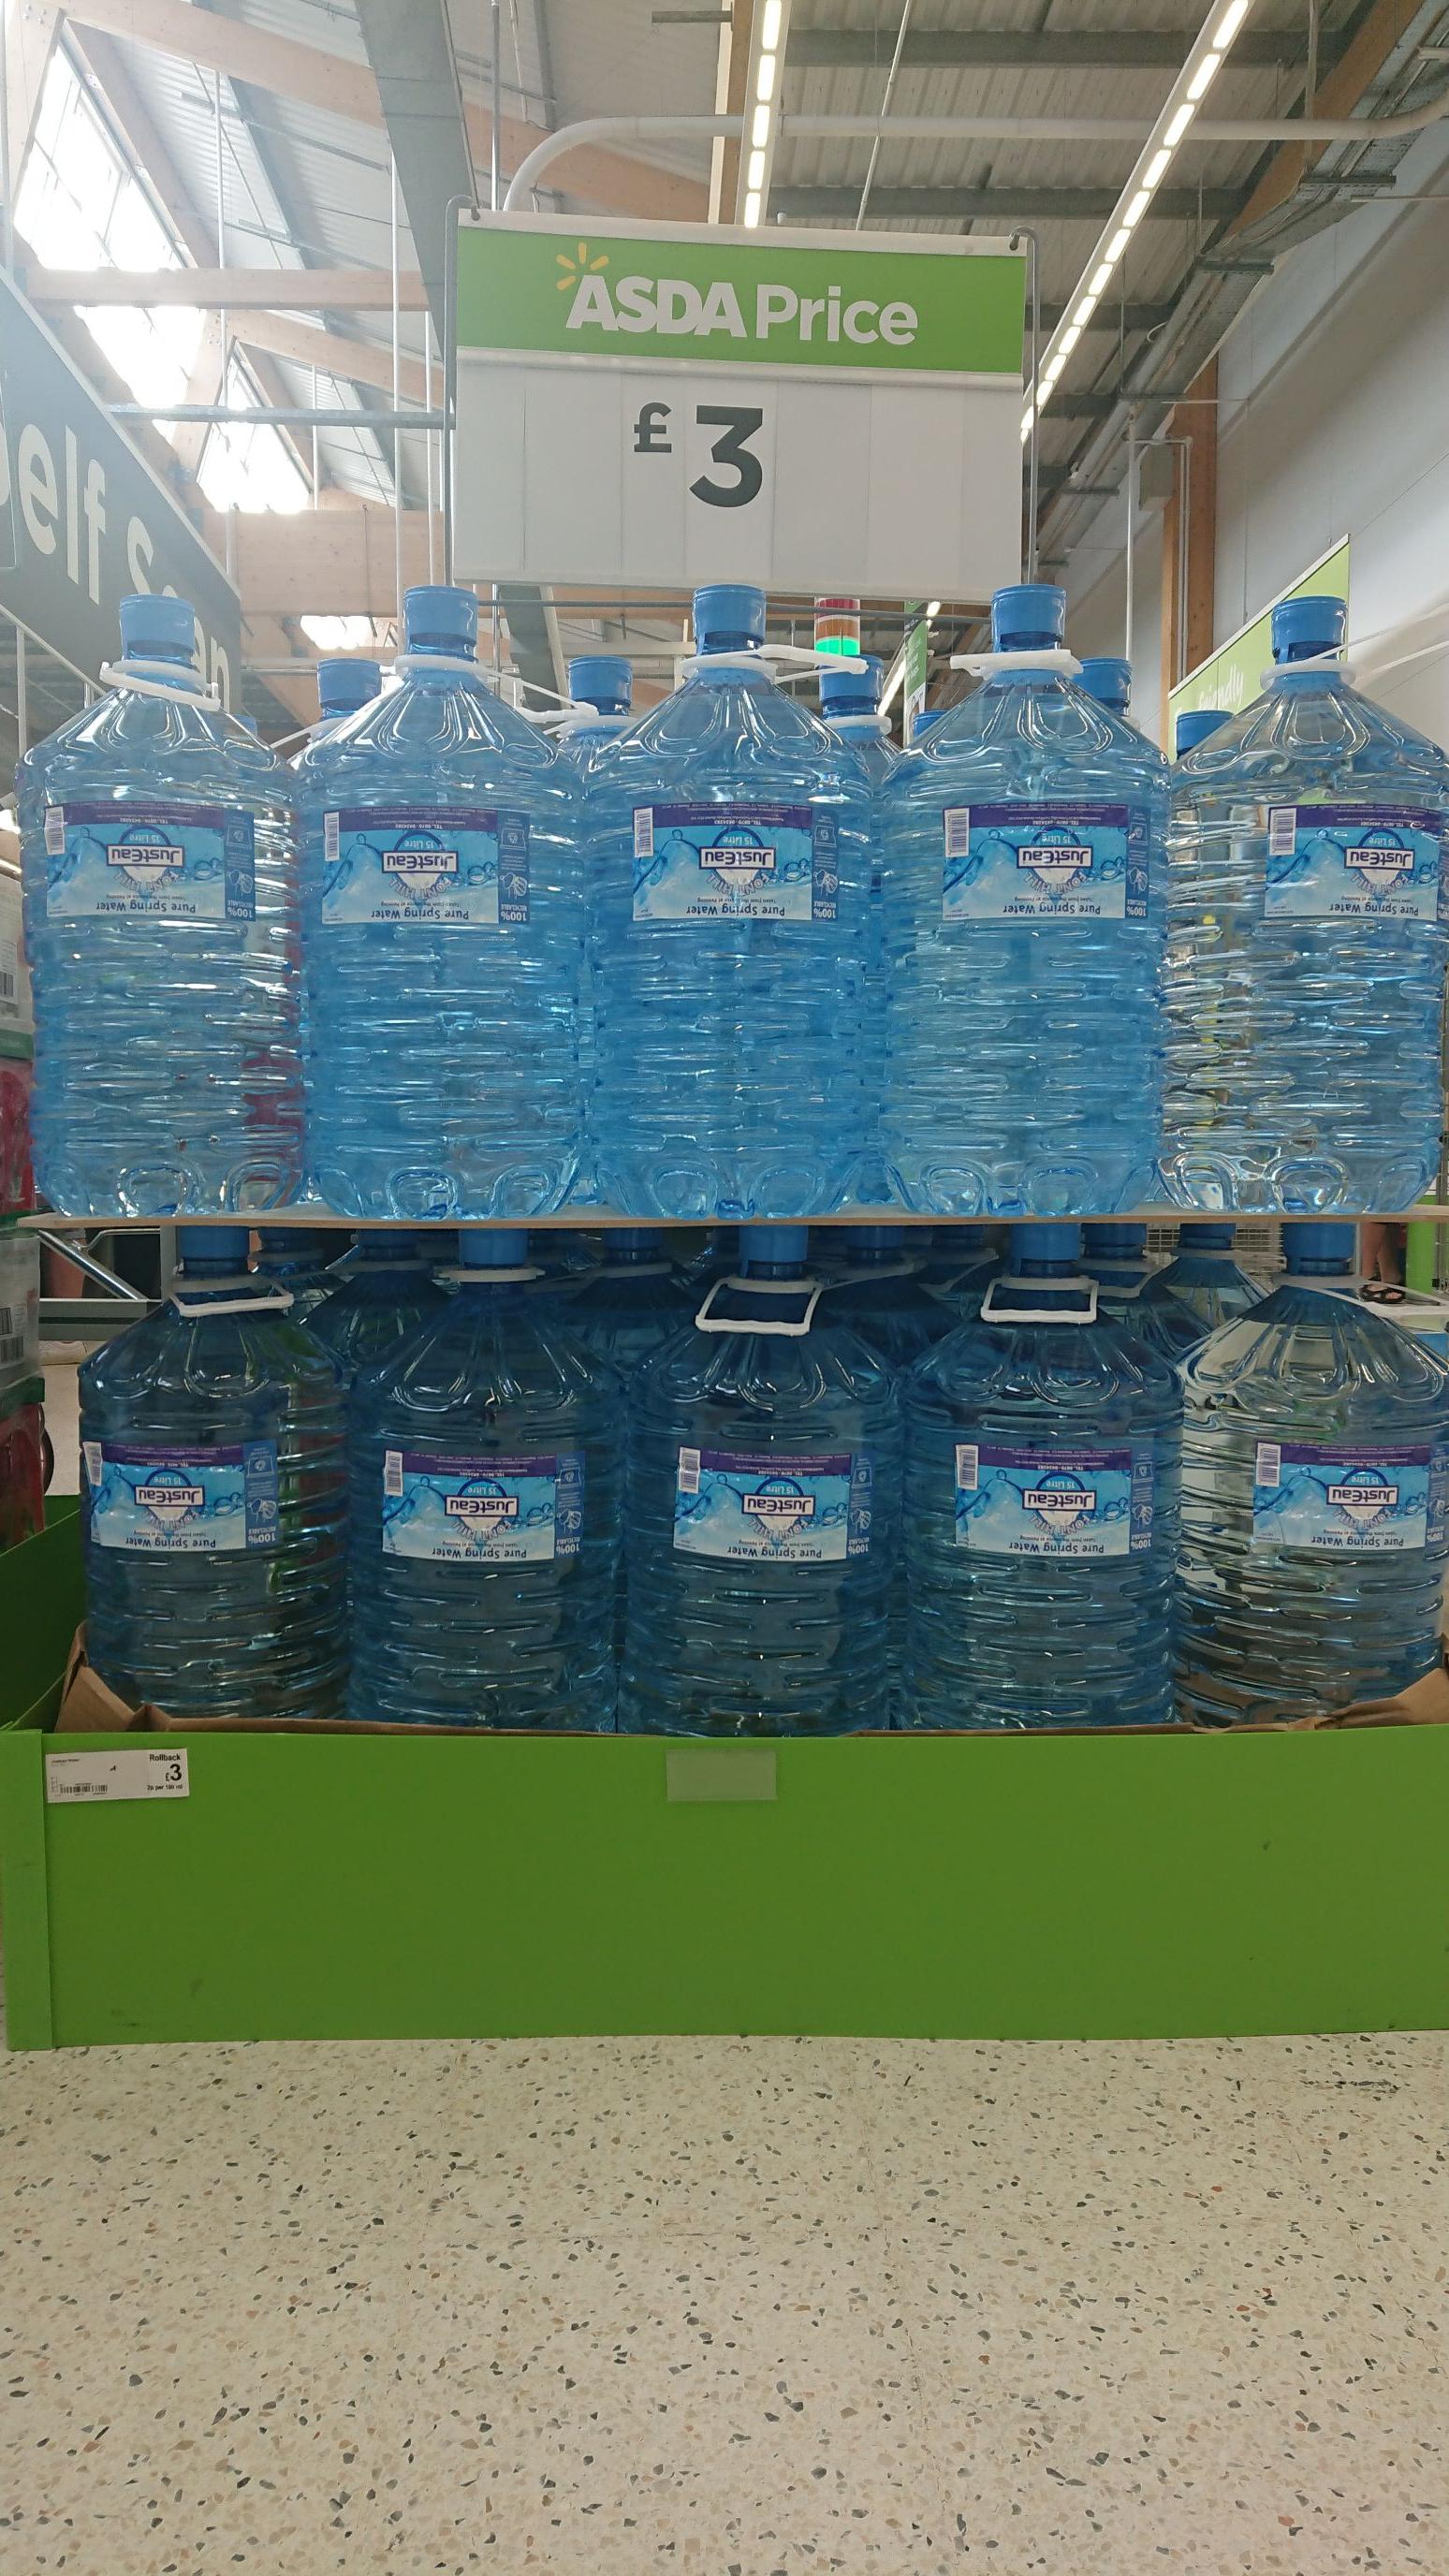 15L water £3 at Asda instore